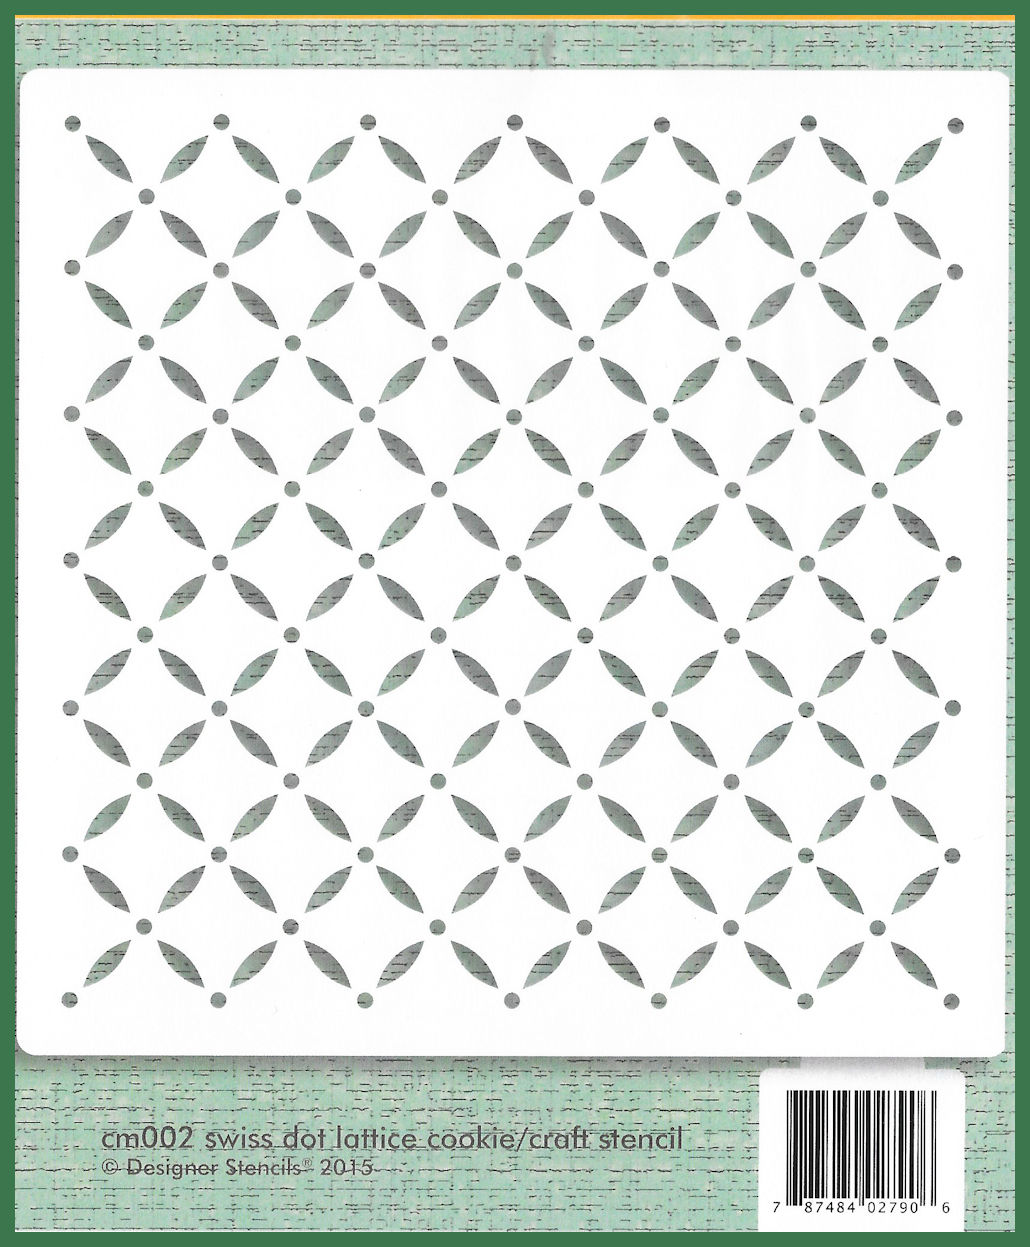 ds-swiss-dot-lattice-8748402790.jpg